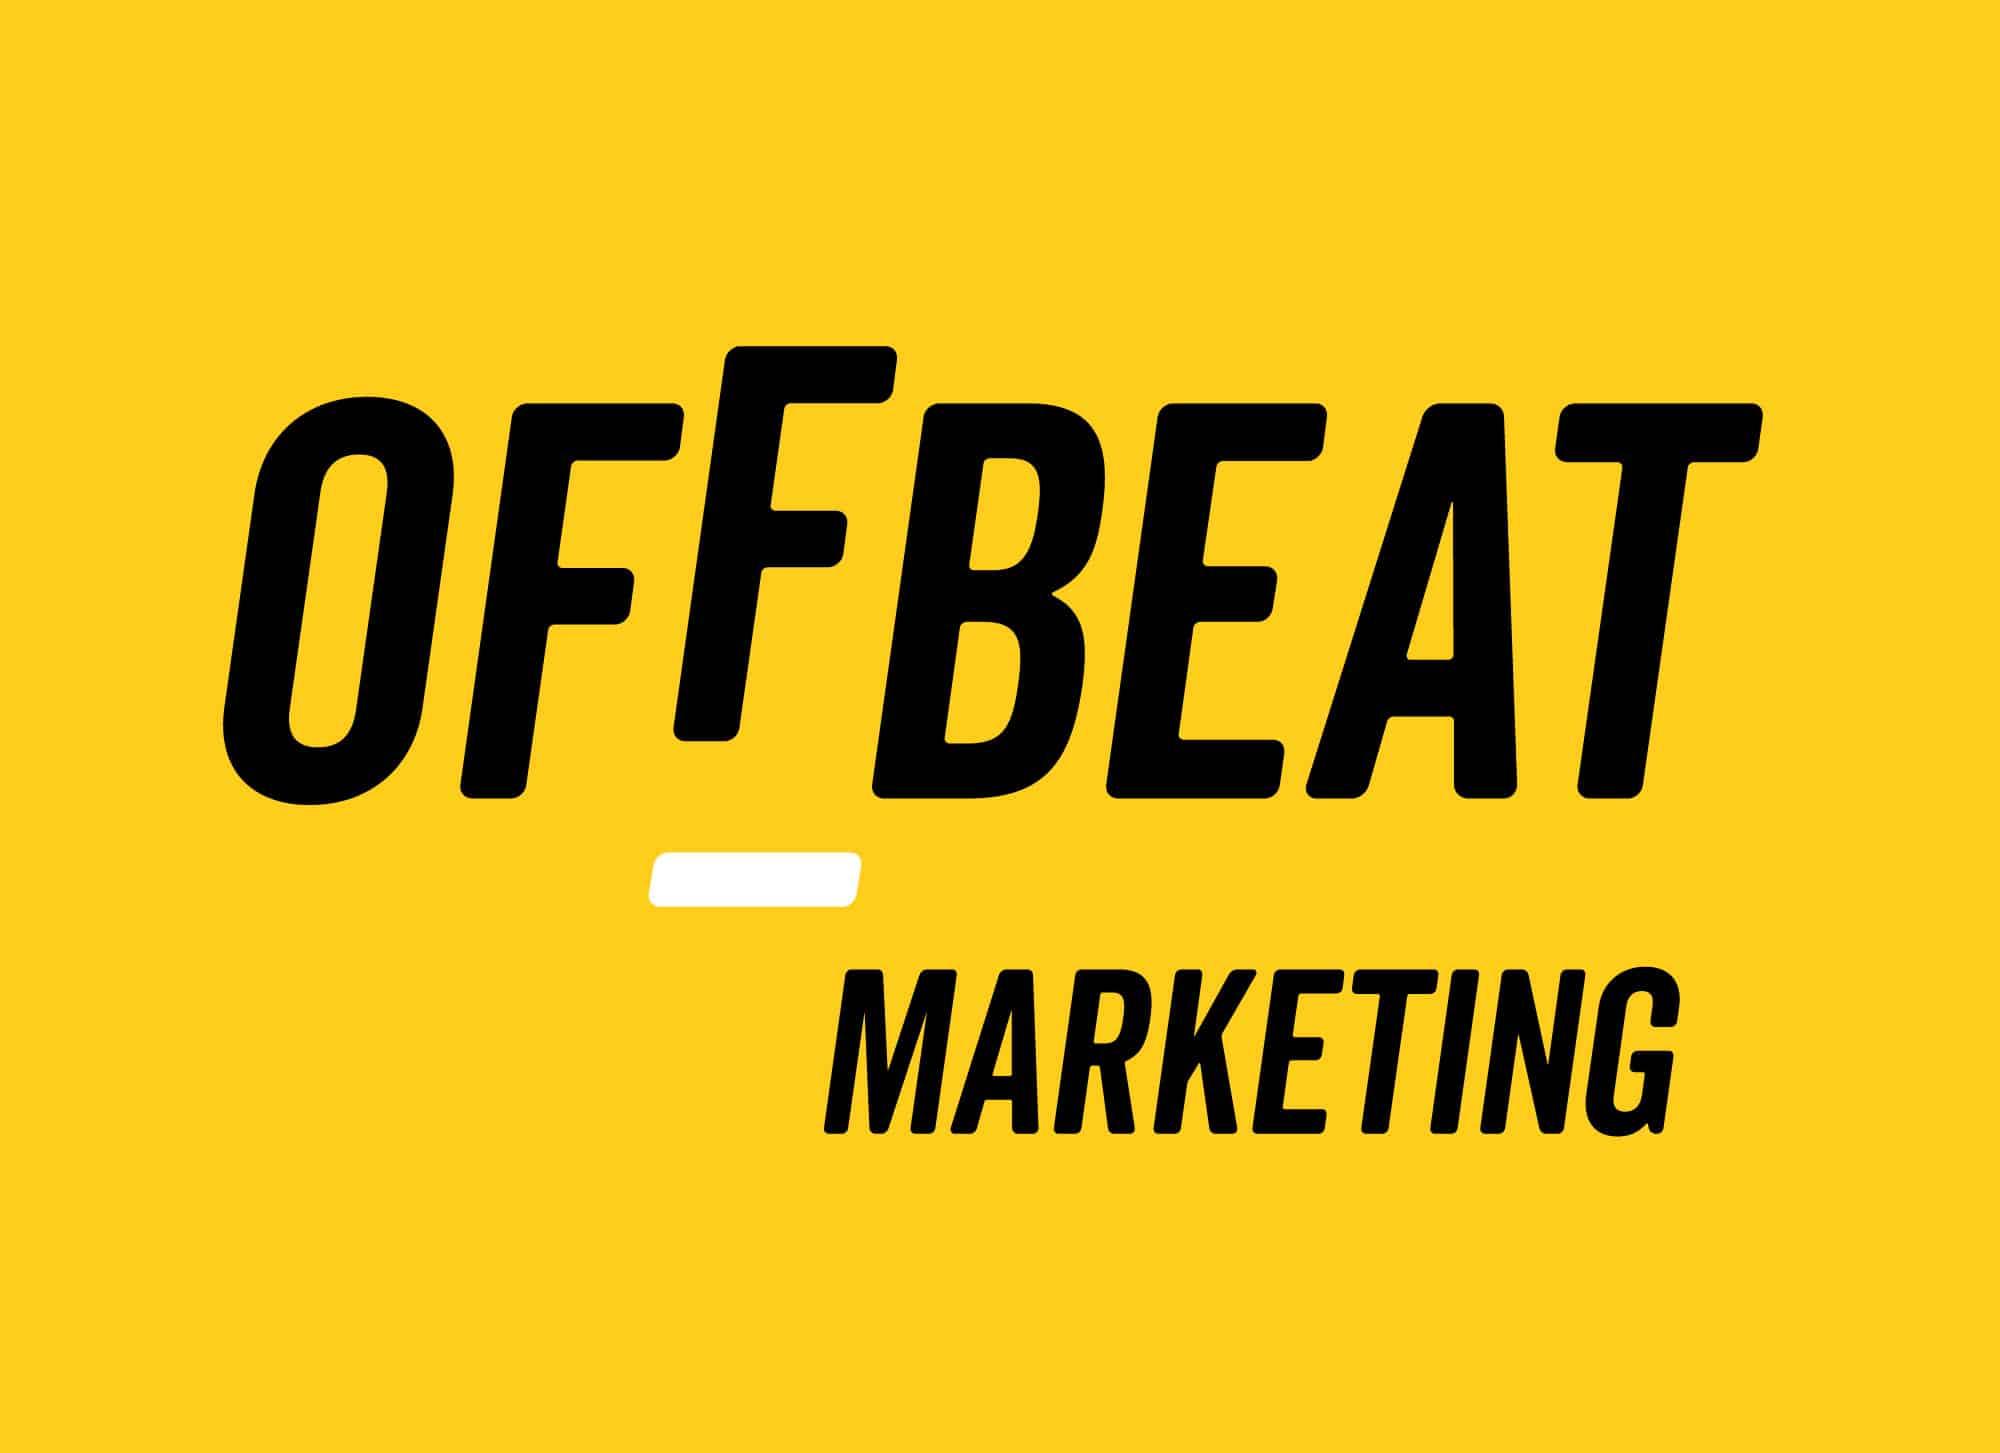 (c) Offbeatmarketing.nl